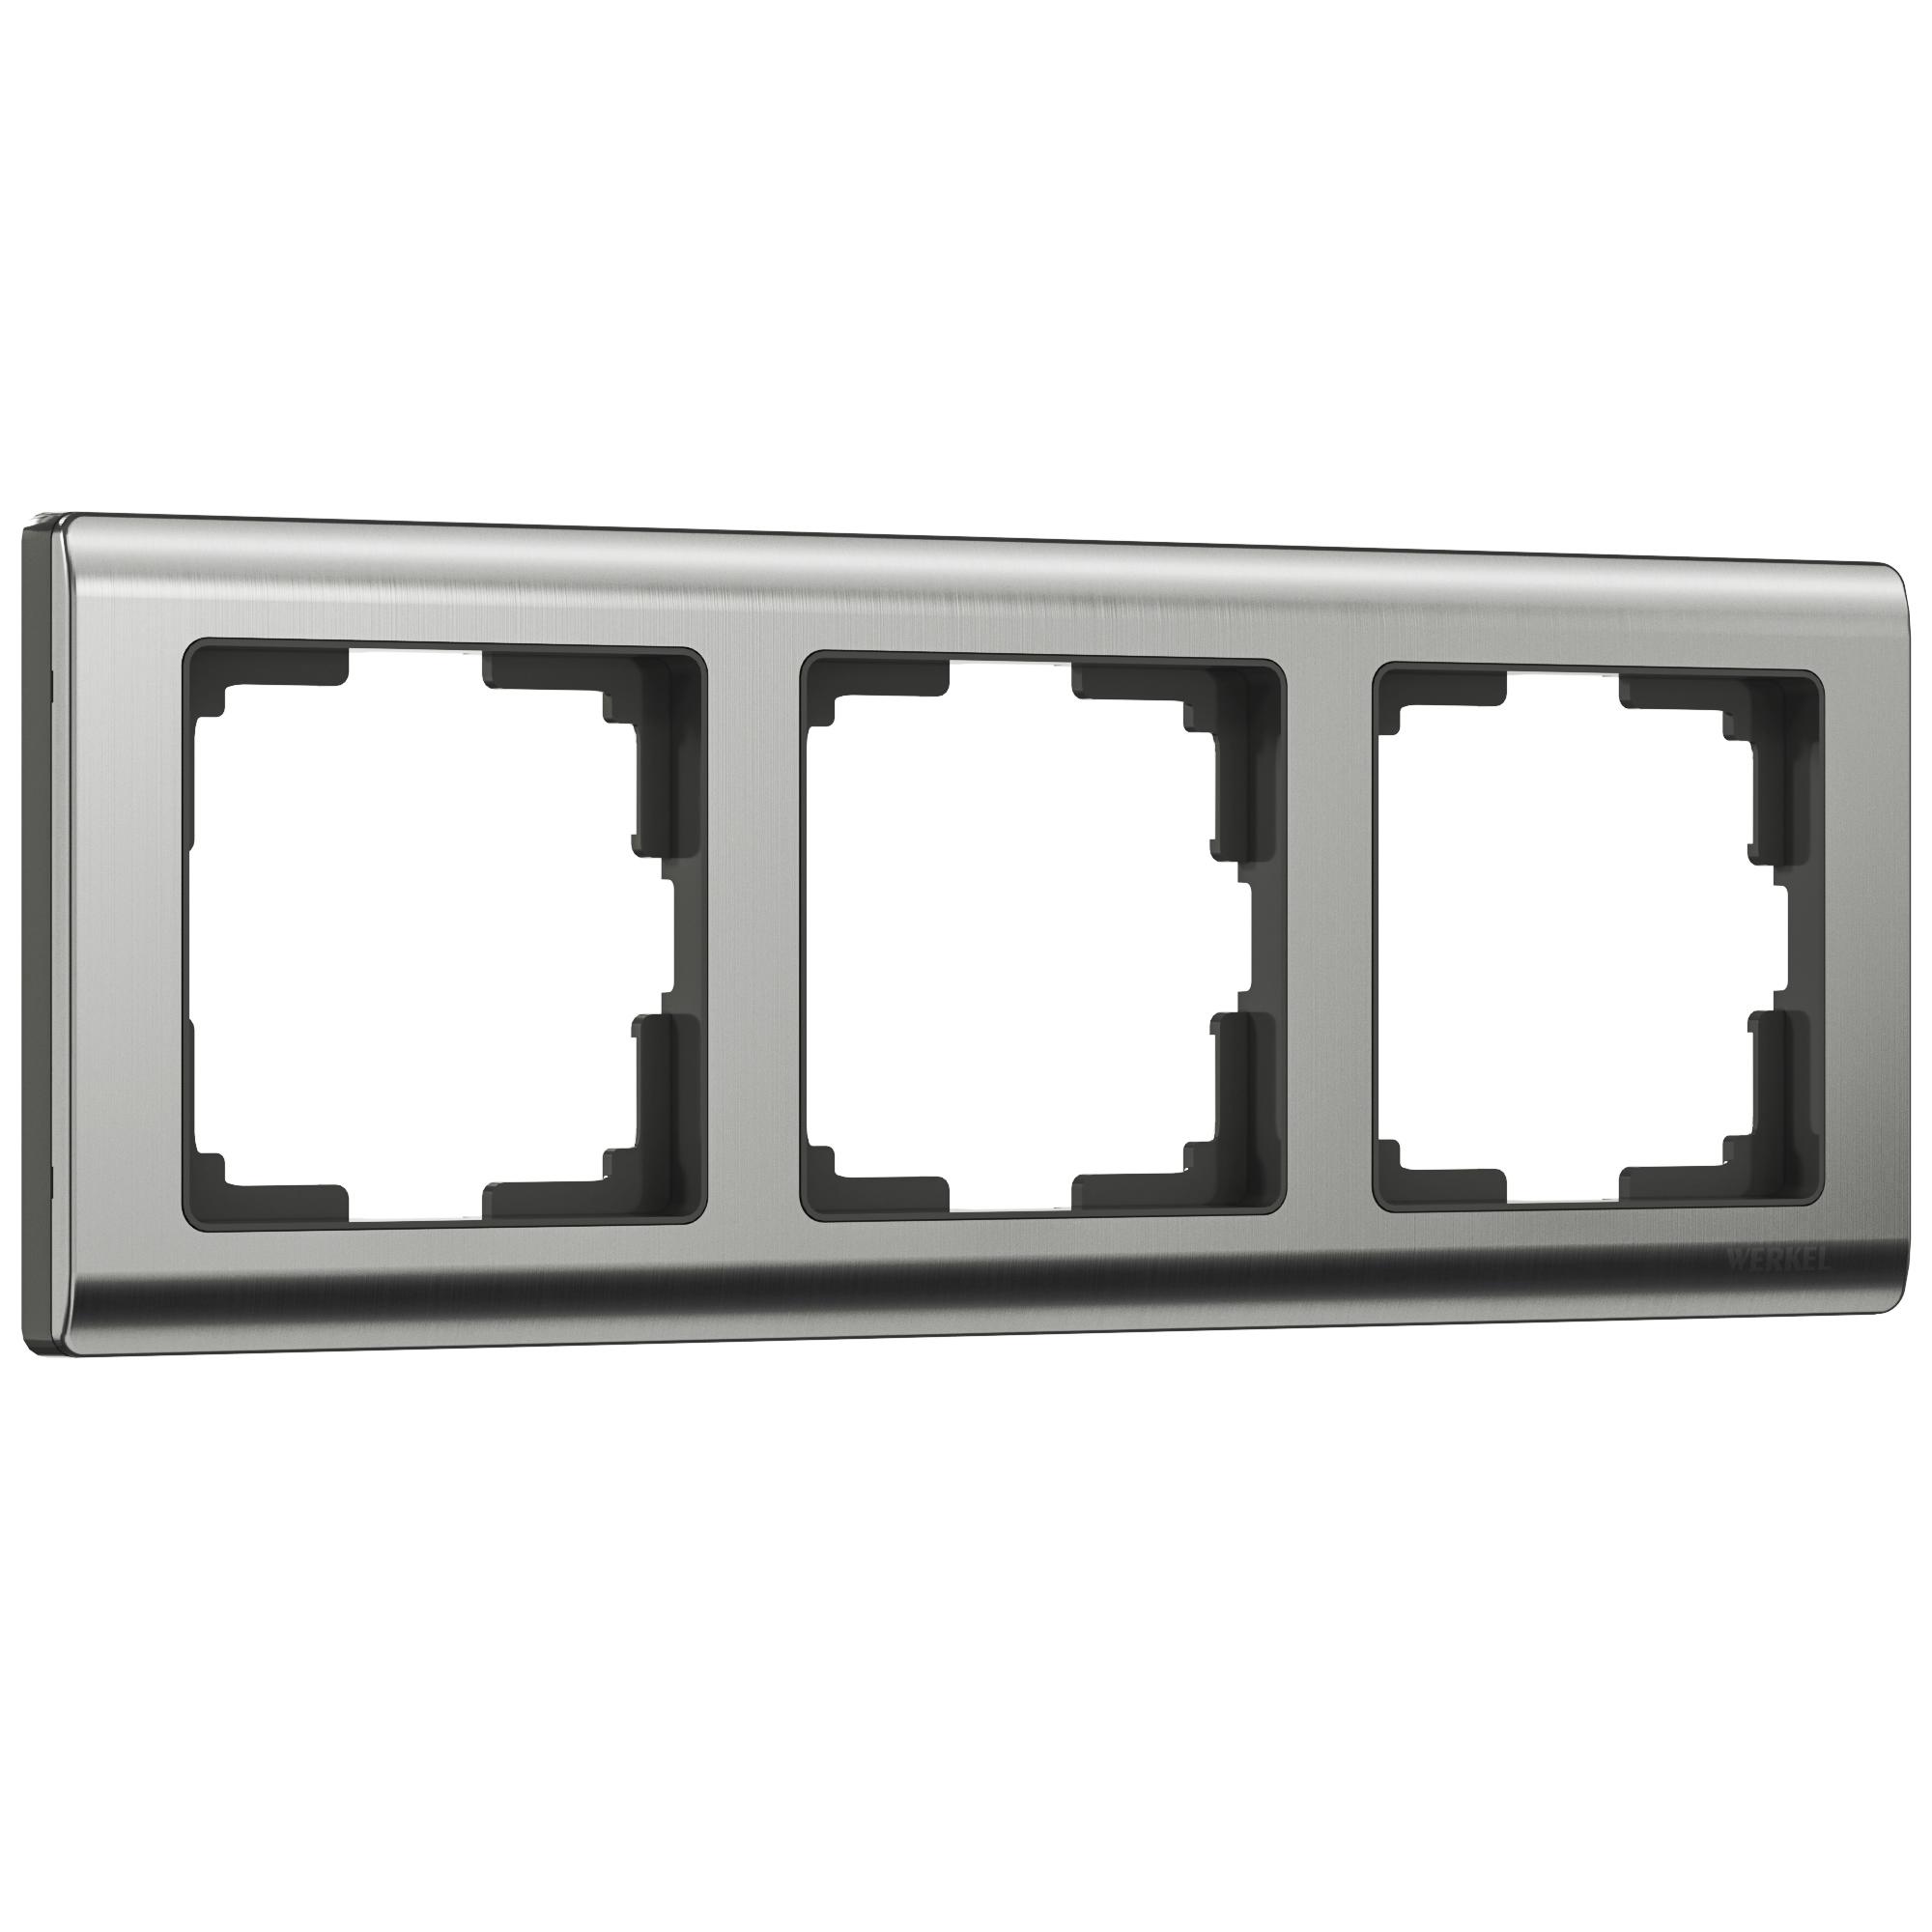 Рамка на 3 поста (глянцевый никель) W0031602